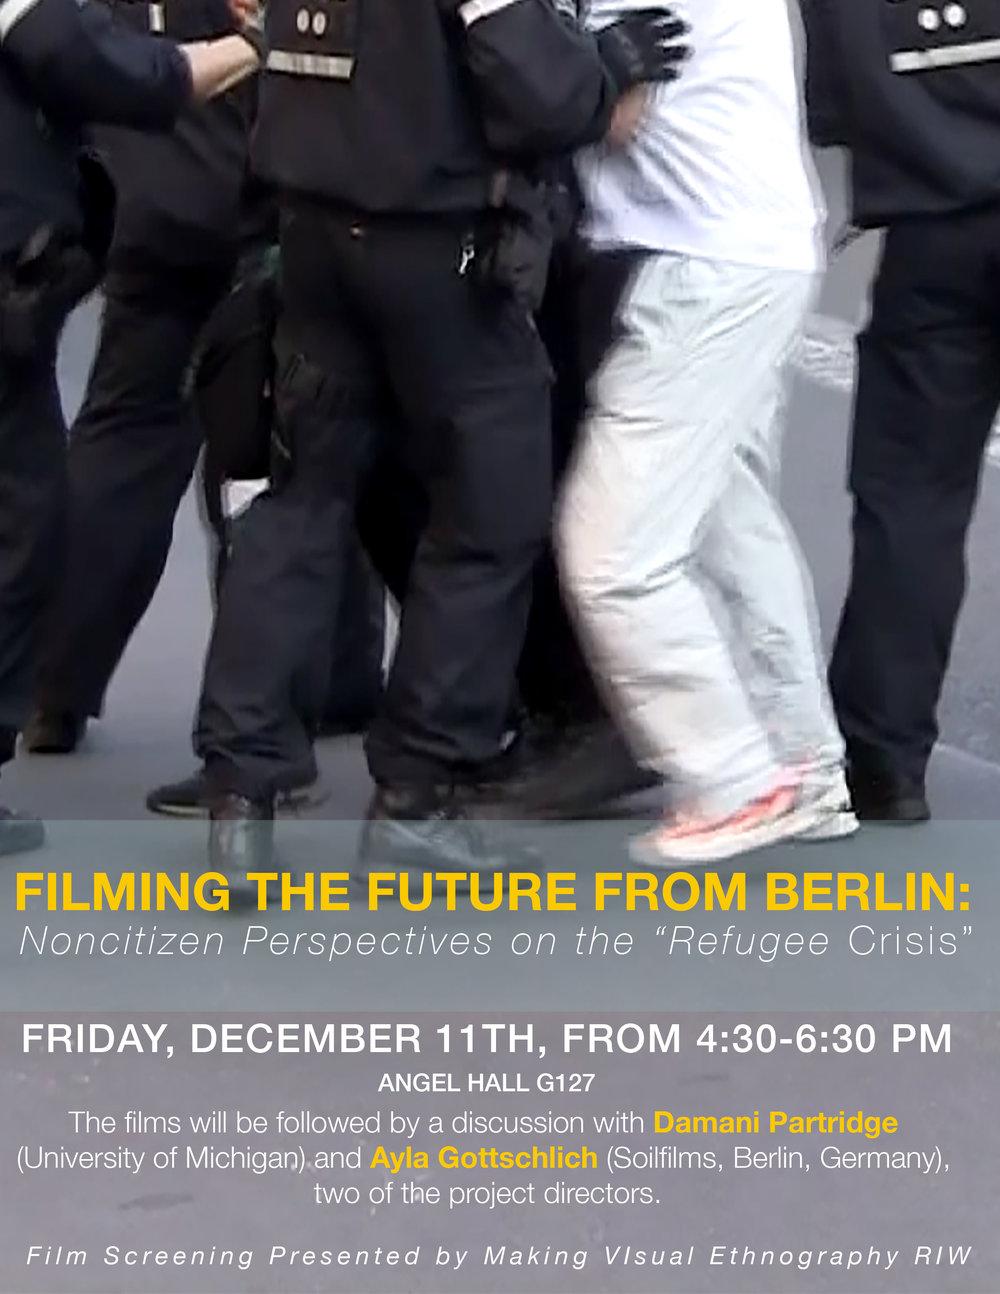 film screening poster for Making Visual Ethnography RIW, University of Michigan